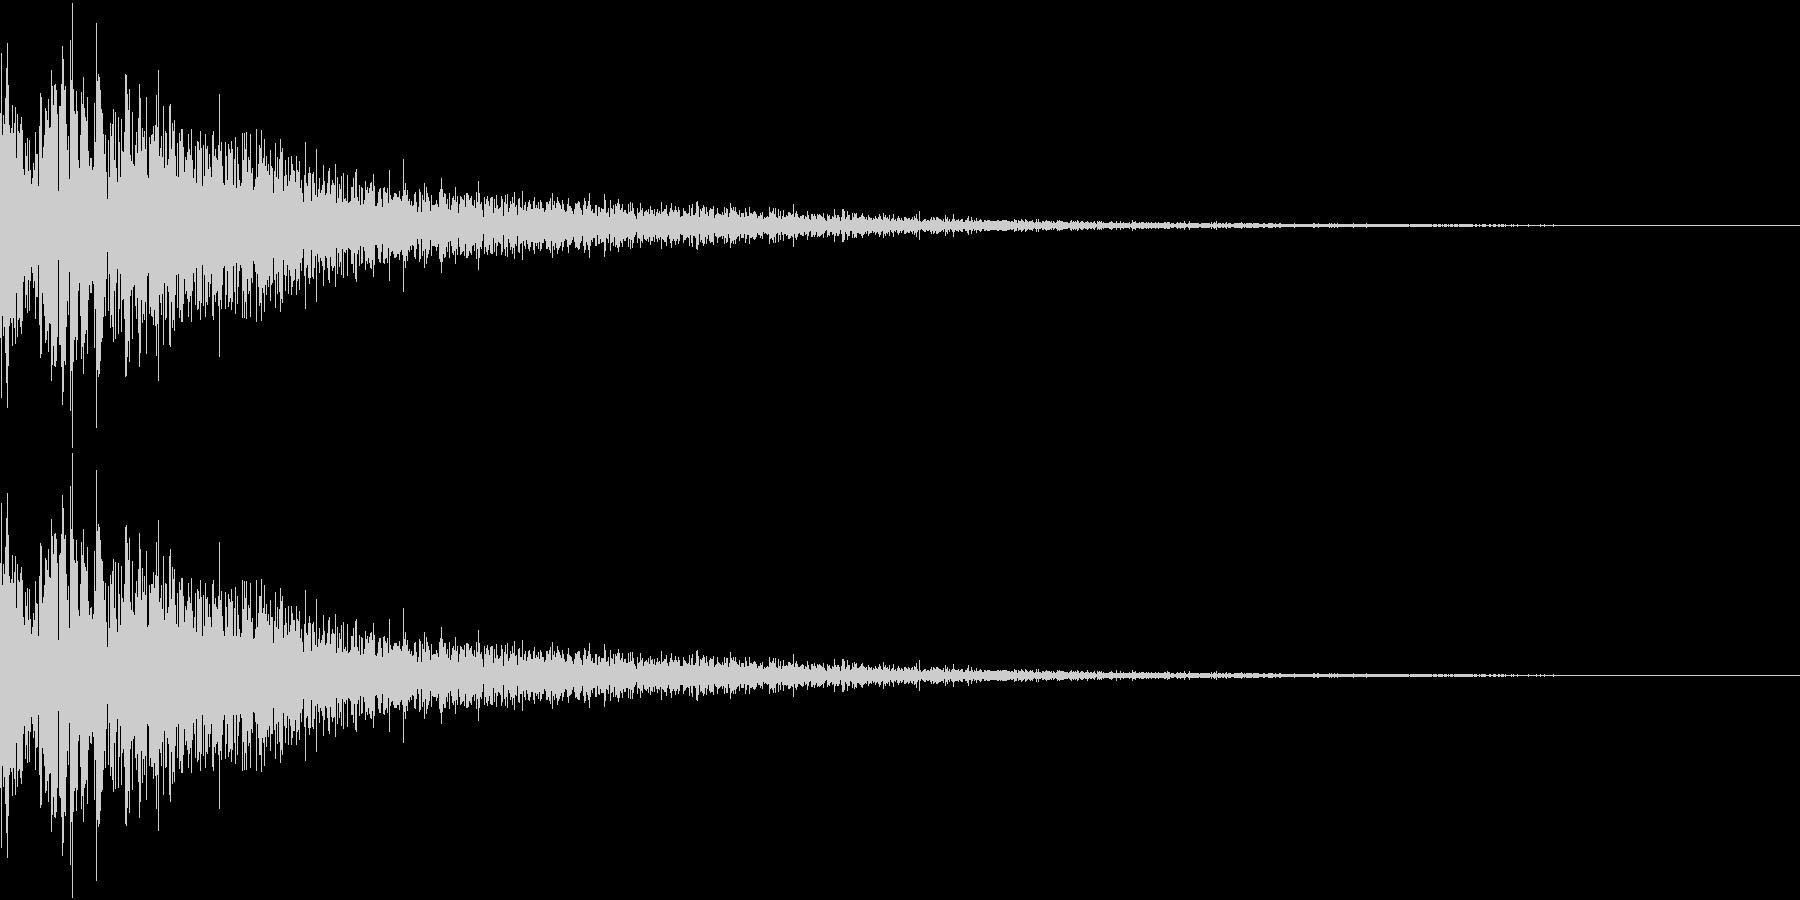 DTM Snare 6 オリジナル音源の未再生の波形